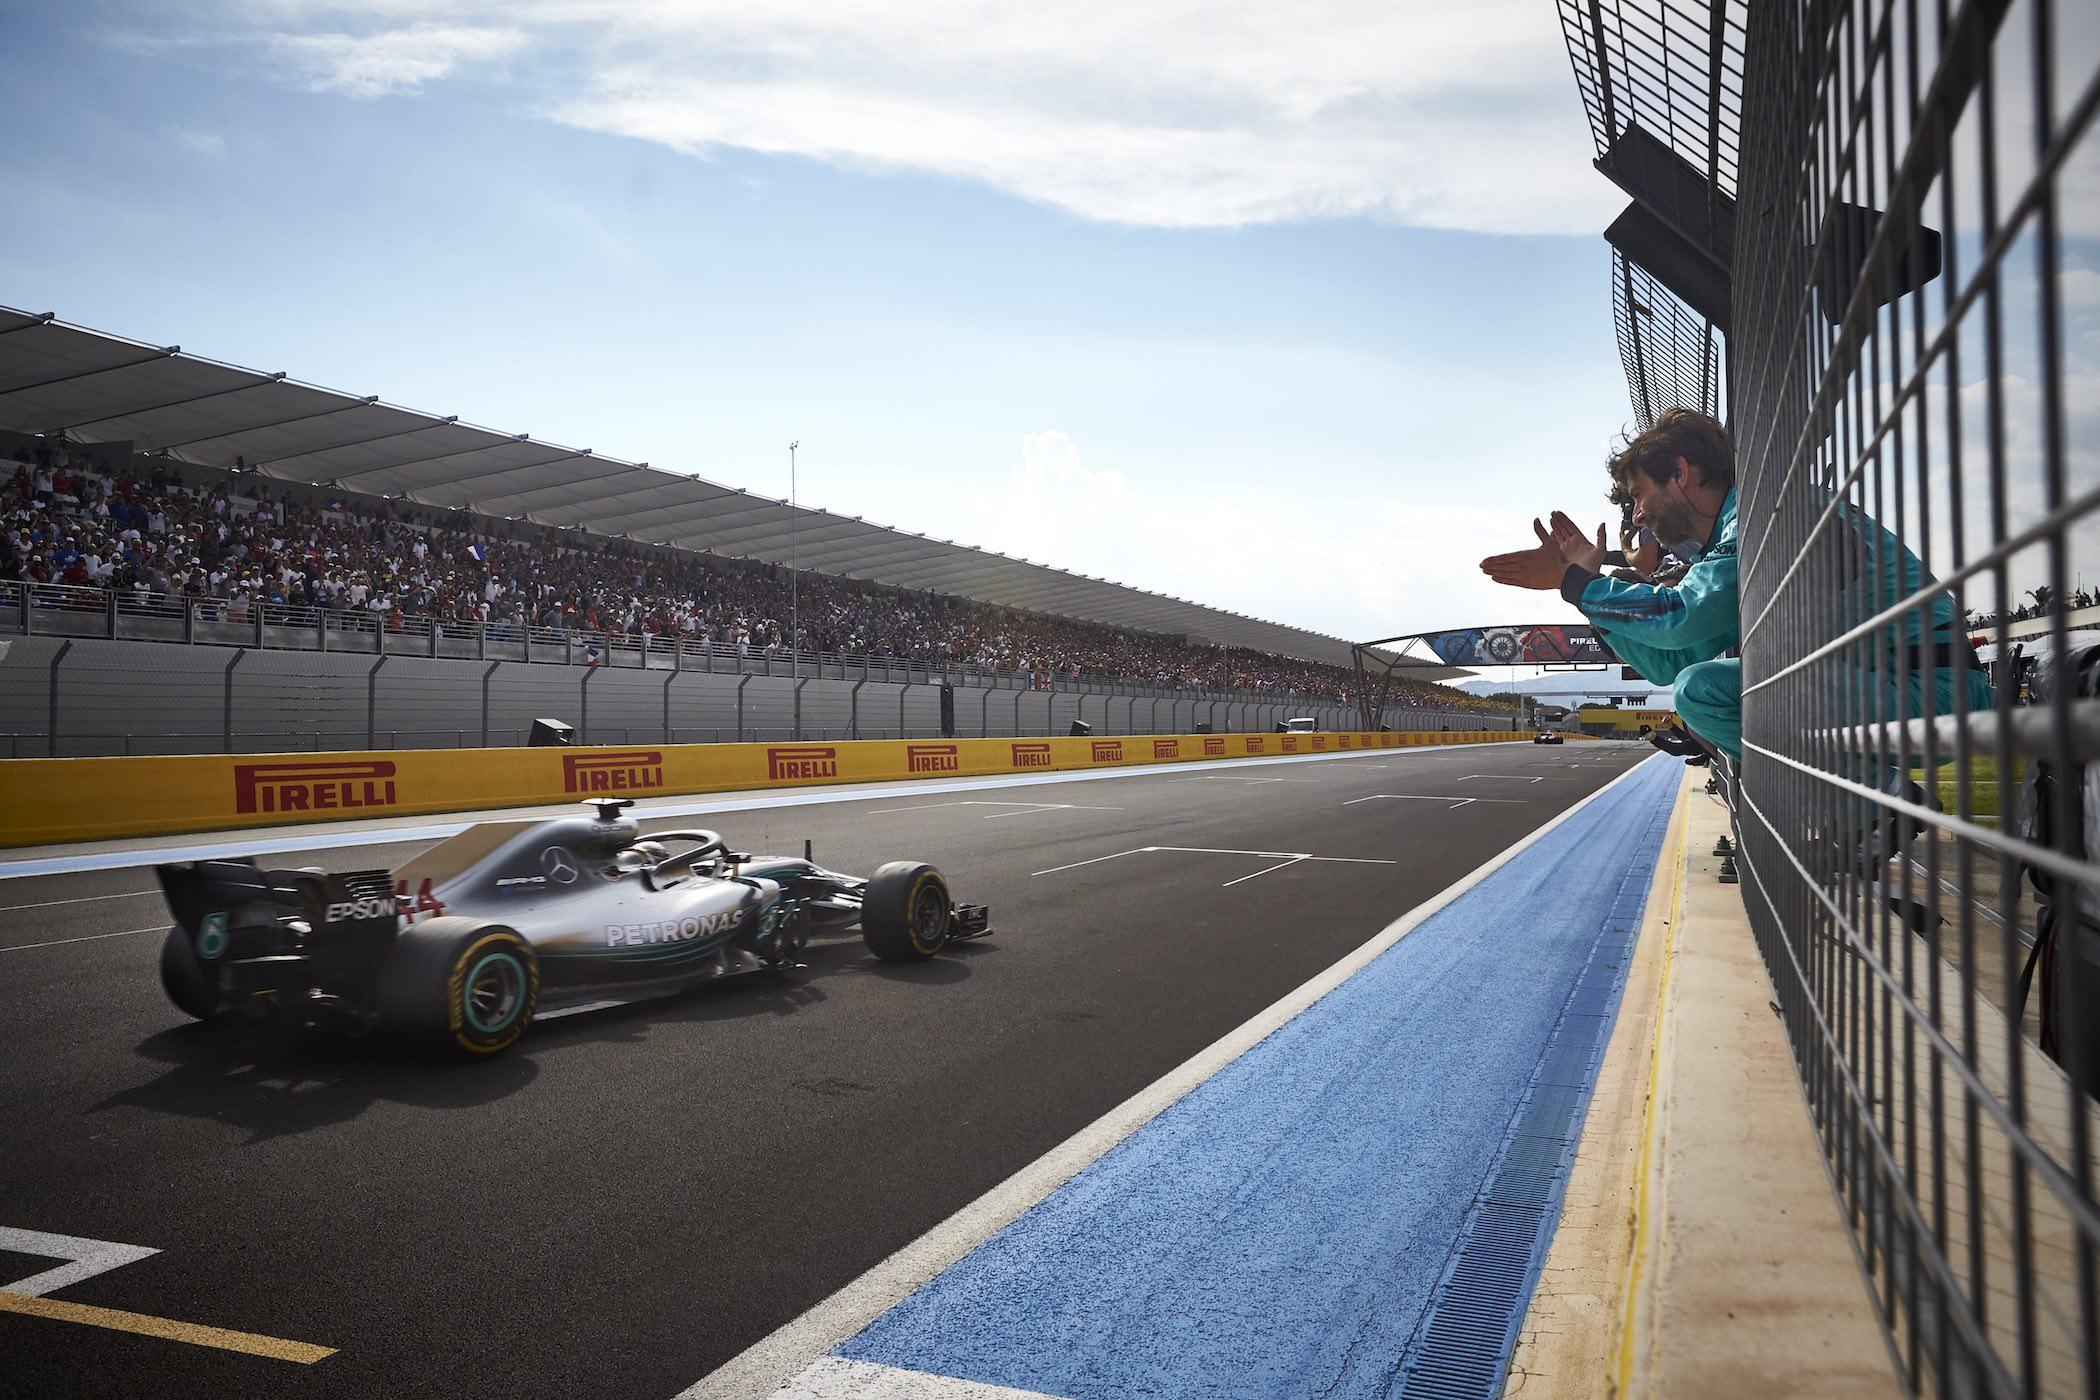 2018 French Grand Prix, Sunday - Steve Etherington